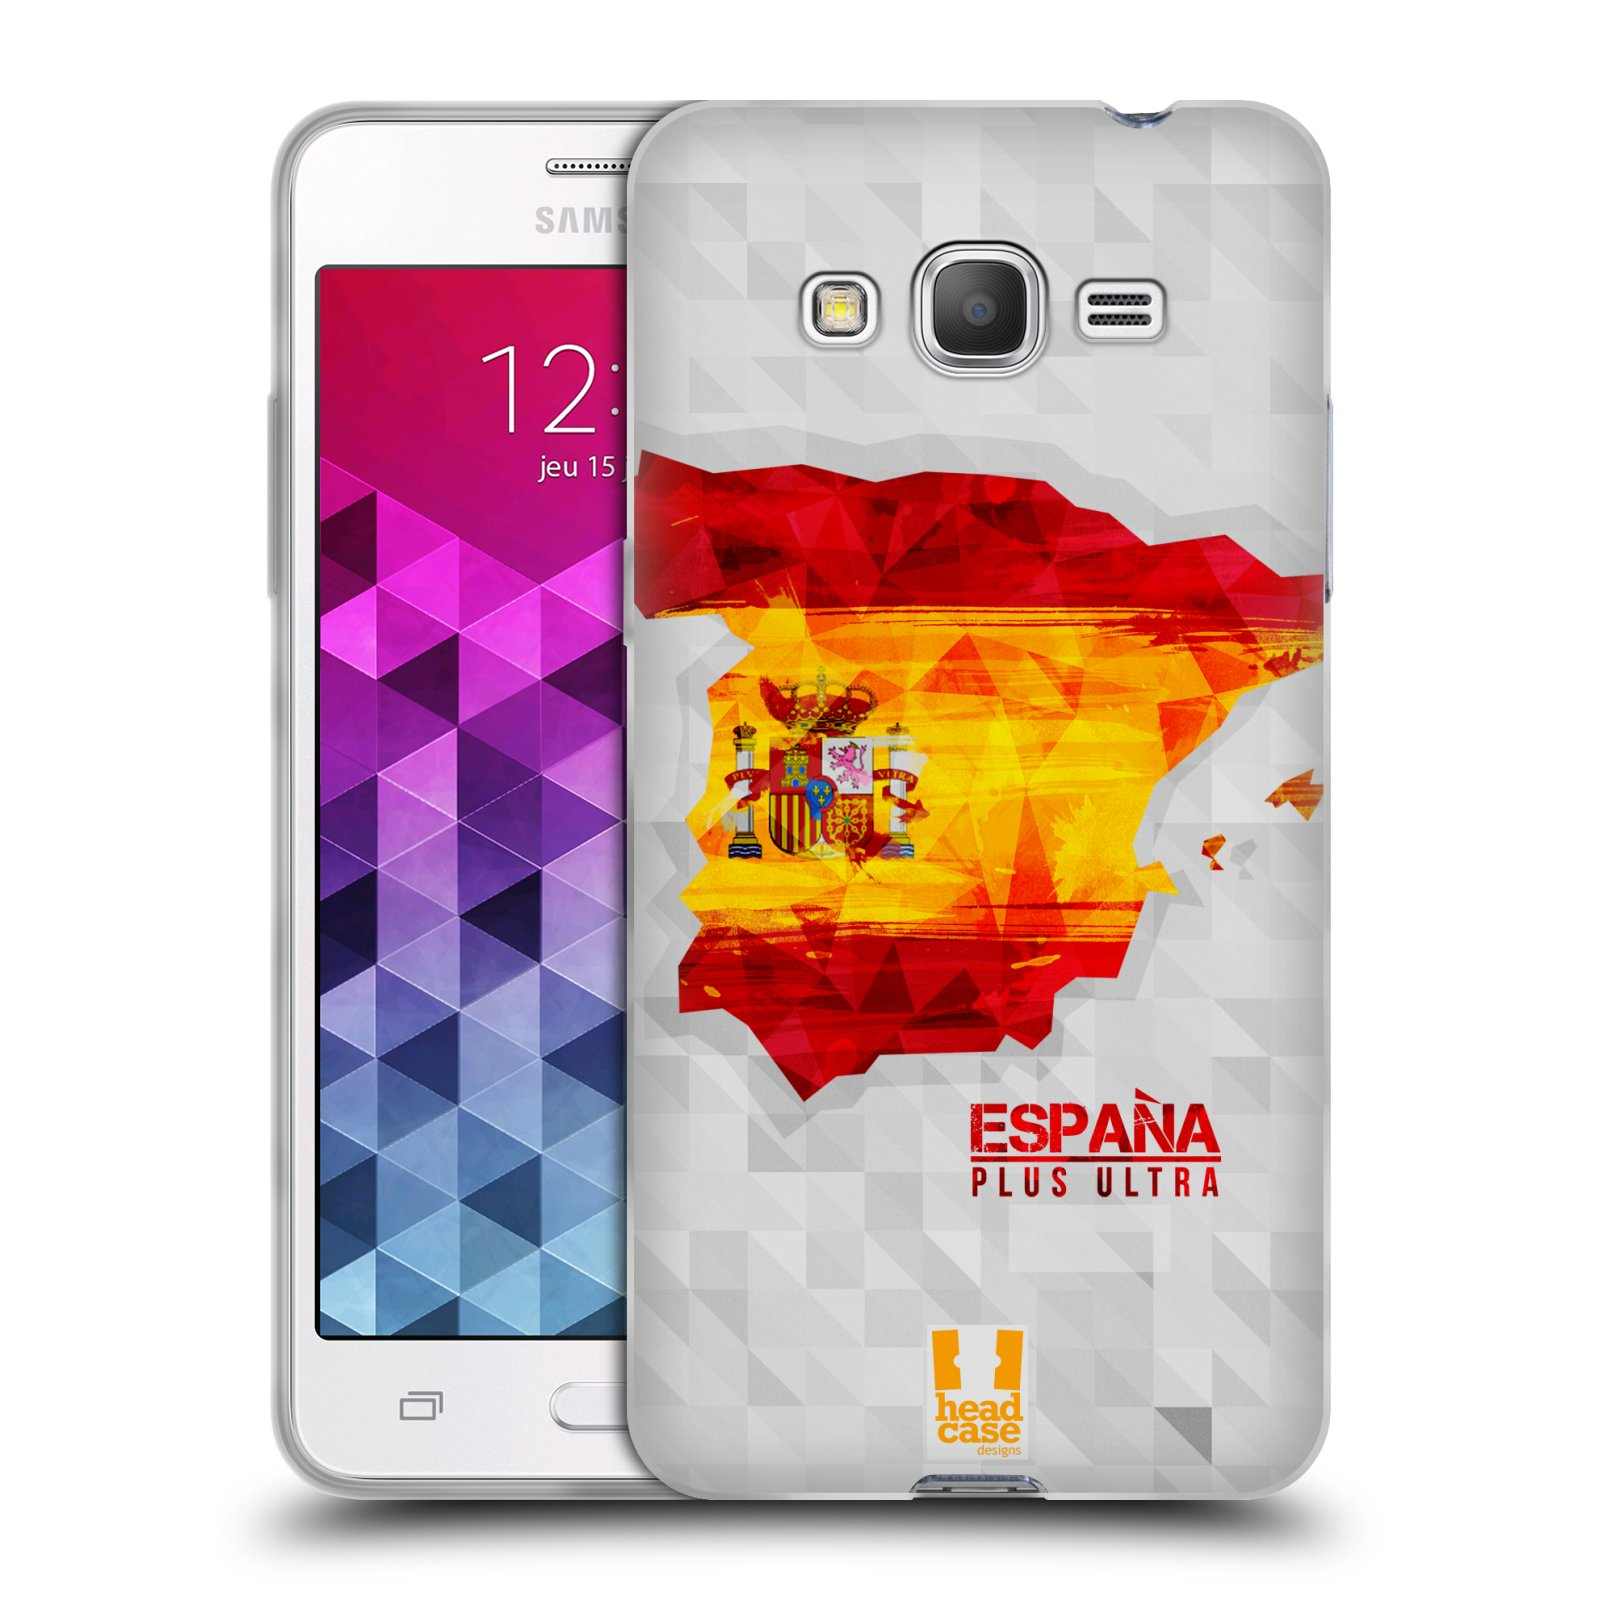 Silikonové pouzdro na mobil Samsung Galaxy Grand Prime VE HEAD CASE GEOMAPA ŠPANĚLSKO (Silikonový kryt či obal na mobilní telefon Samsung Galaxy Grand Prime VE SM-G531F)